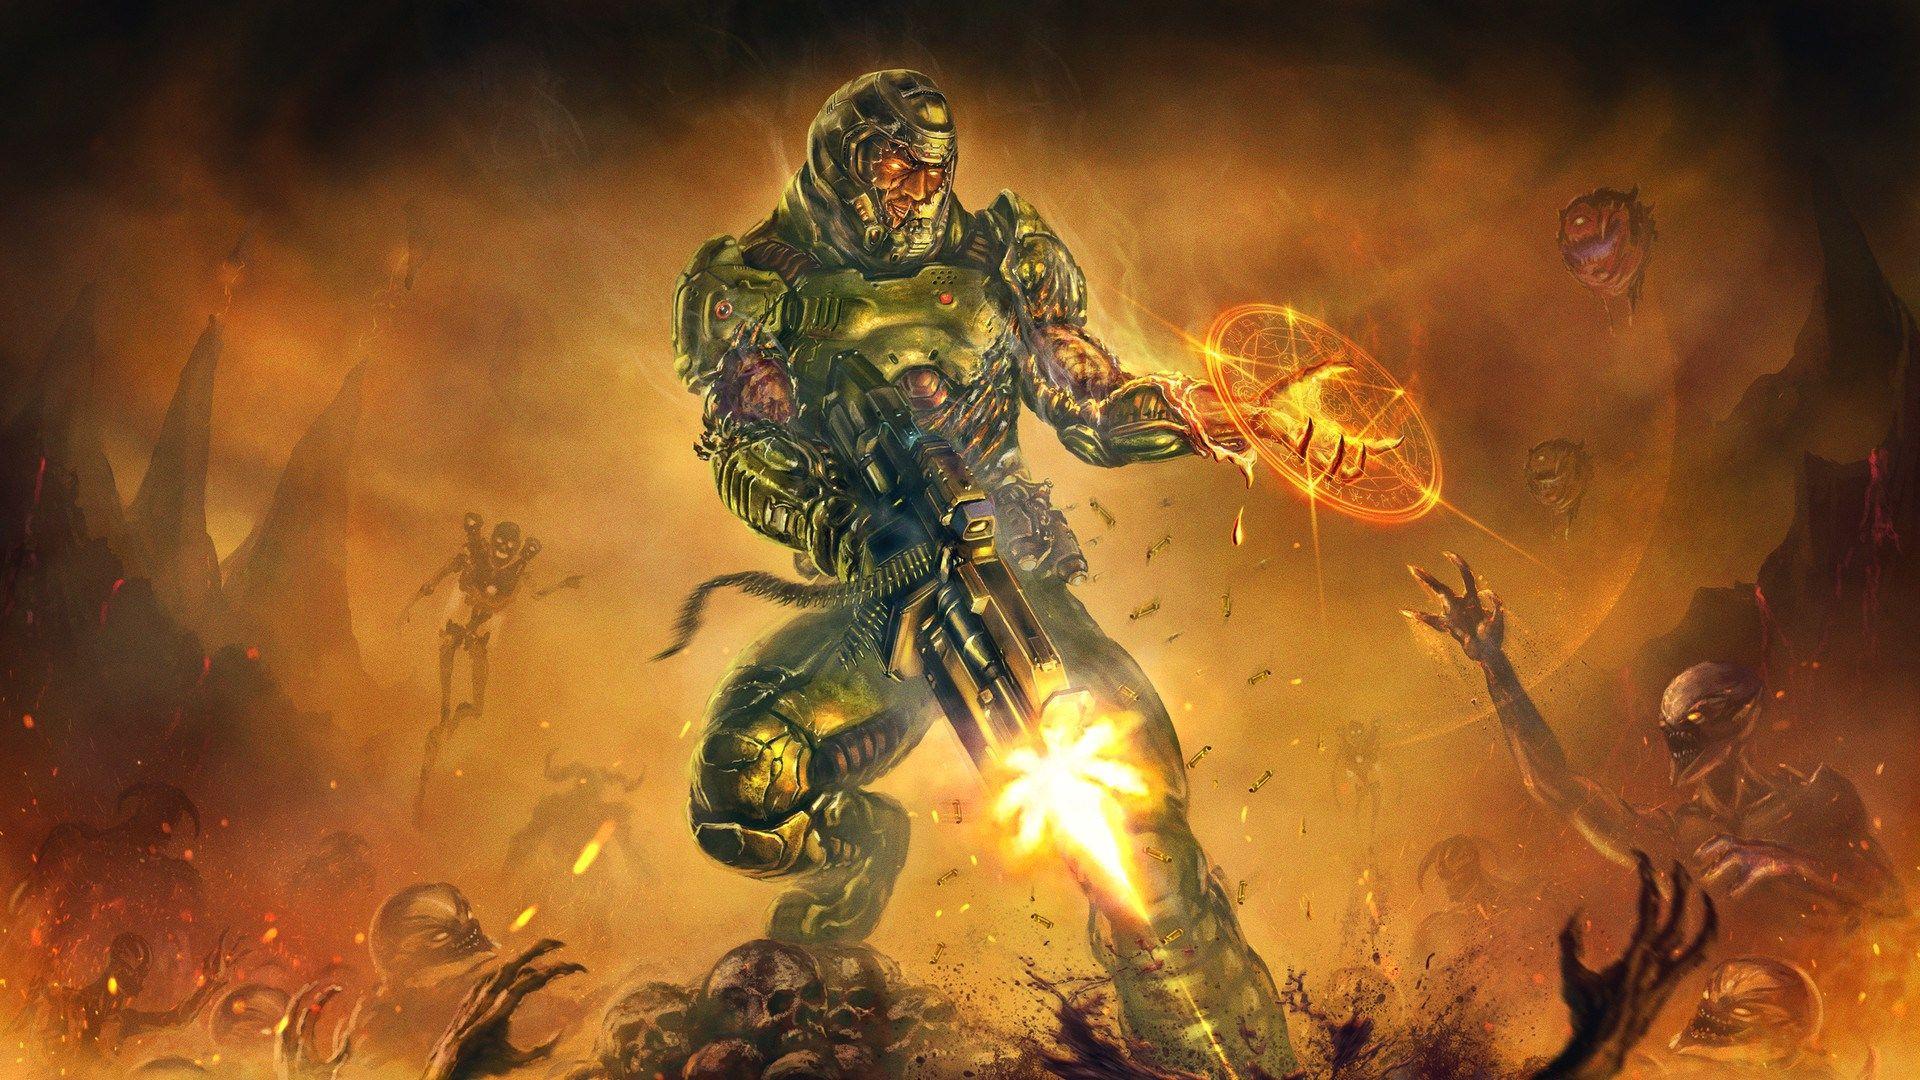 Doom 2016 Theme Background Images Goldwin Robin 2017 03 22